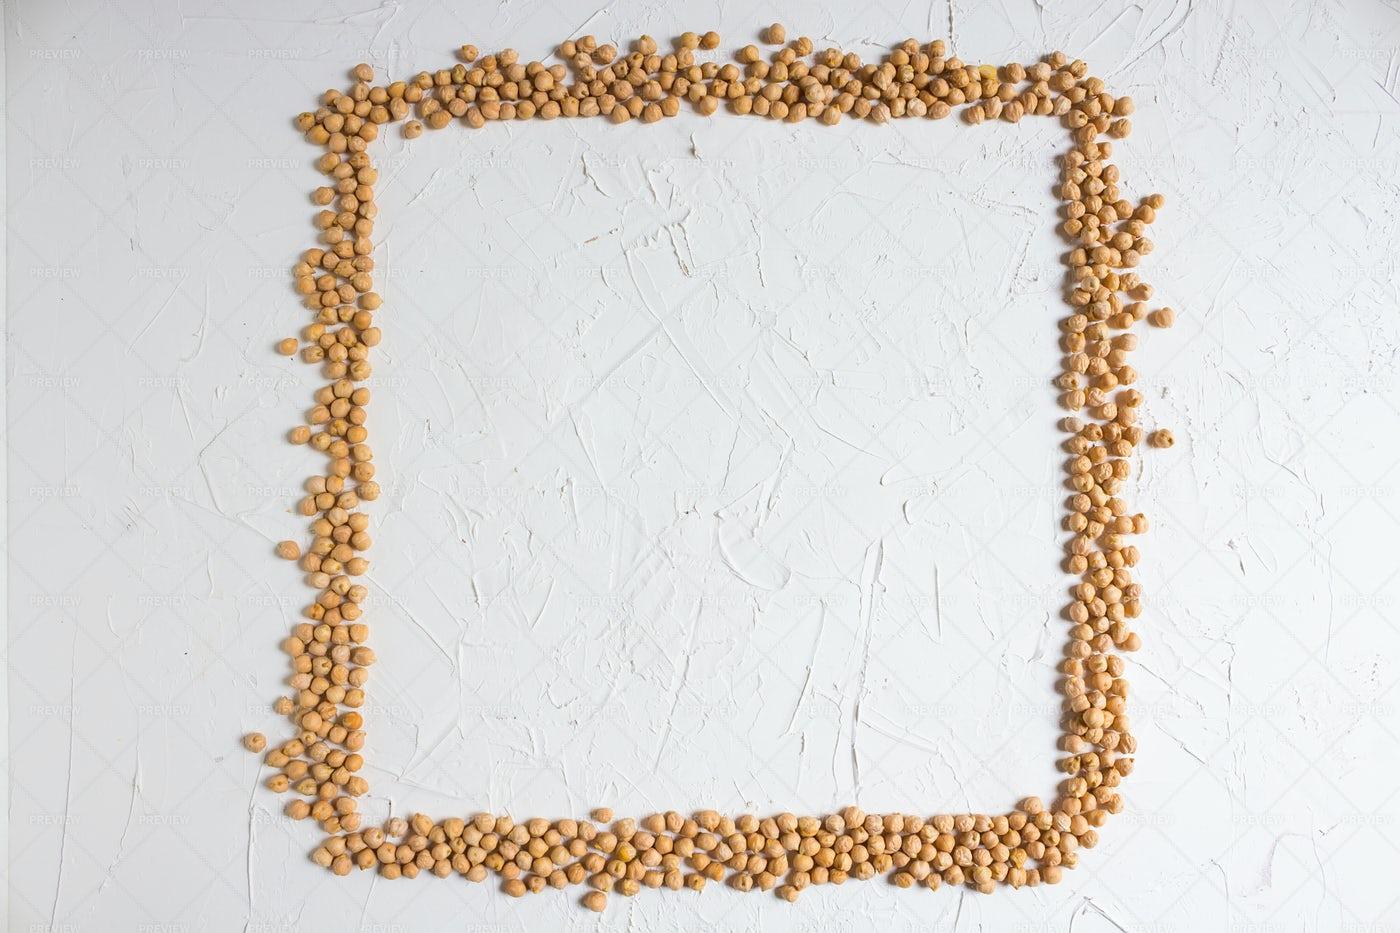 Square Frame Of Chickpeas: Stock Photos